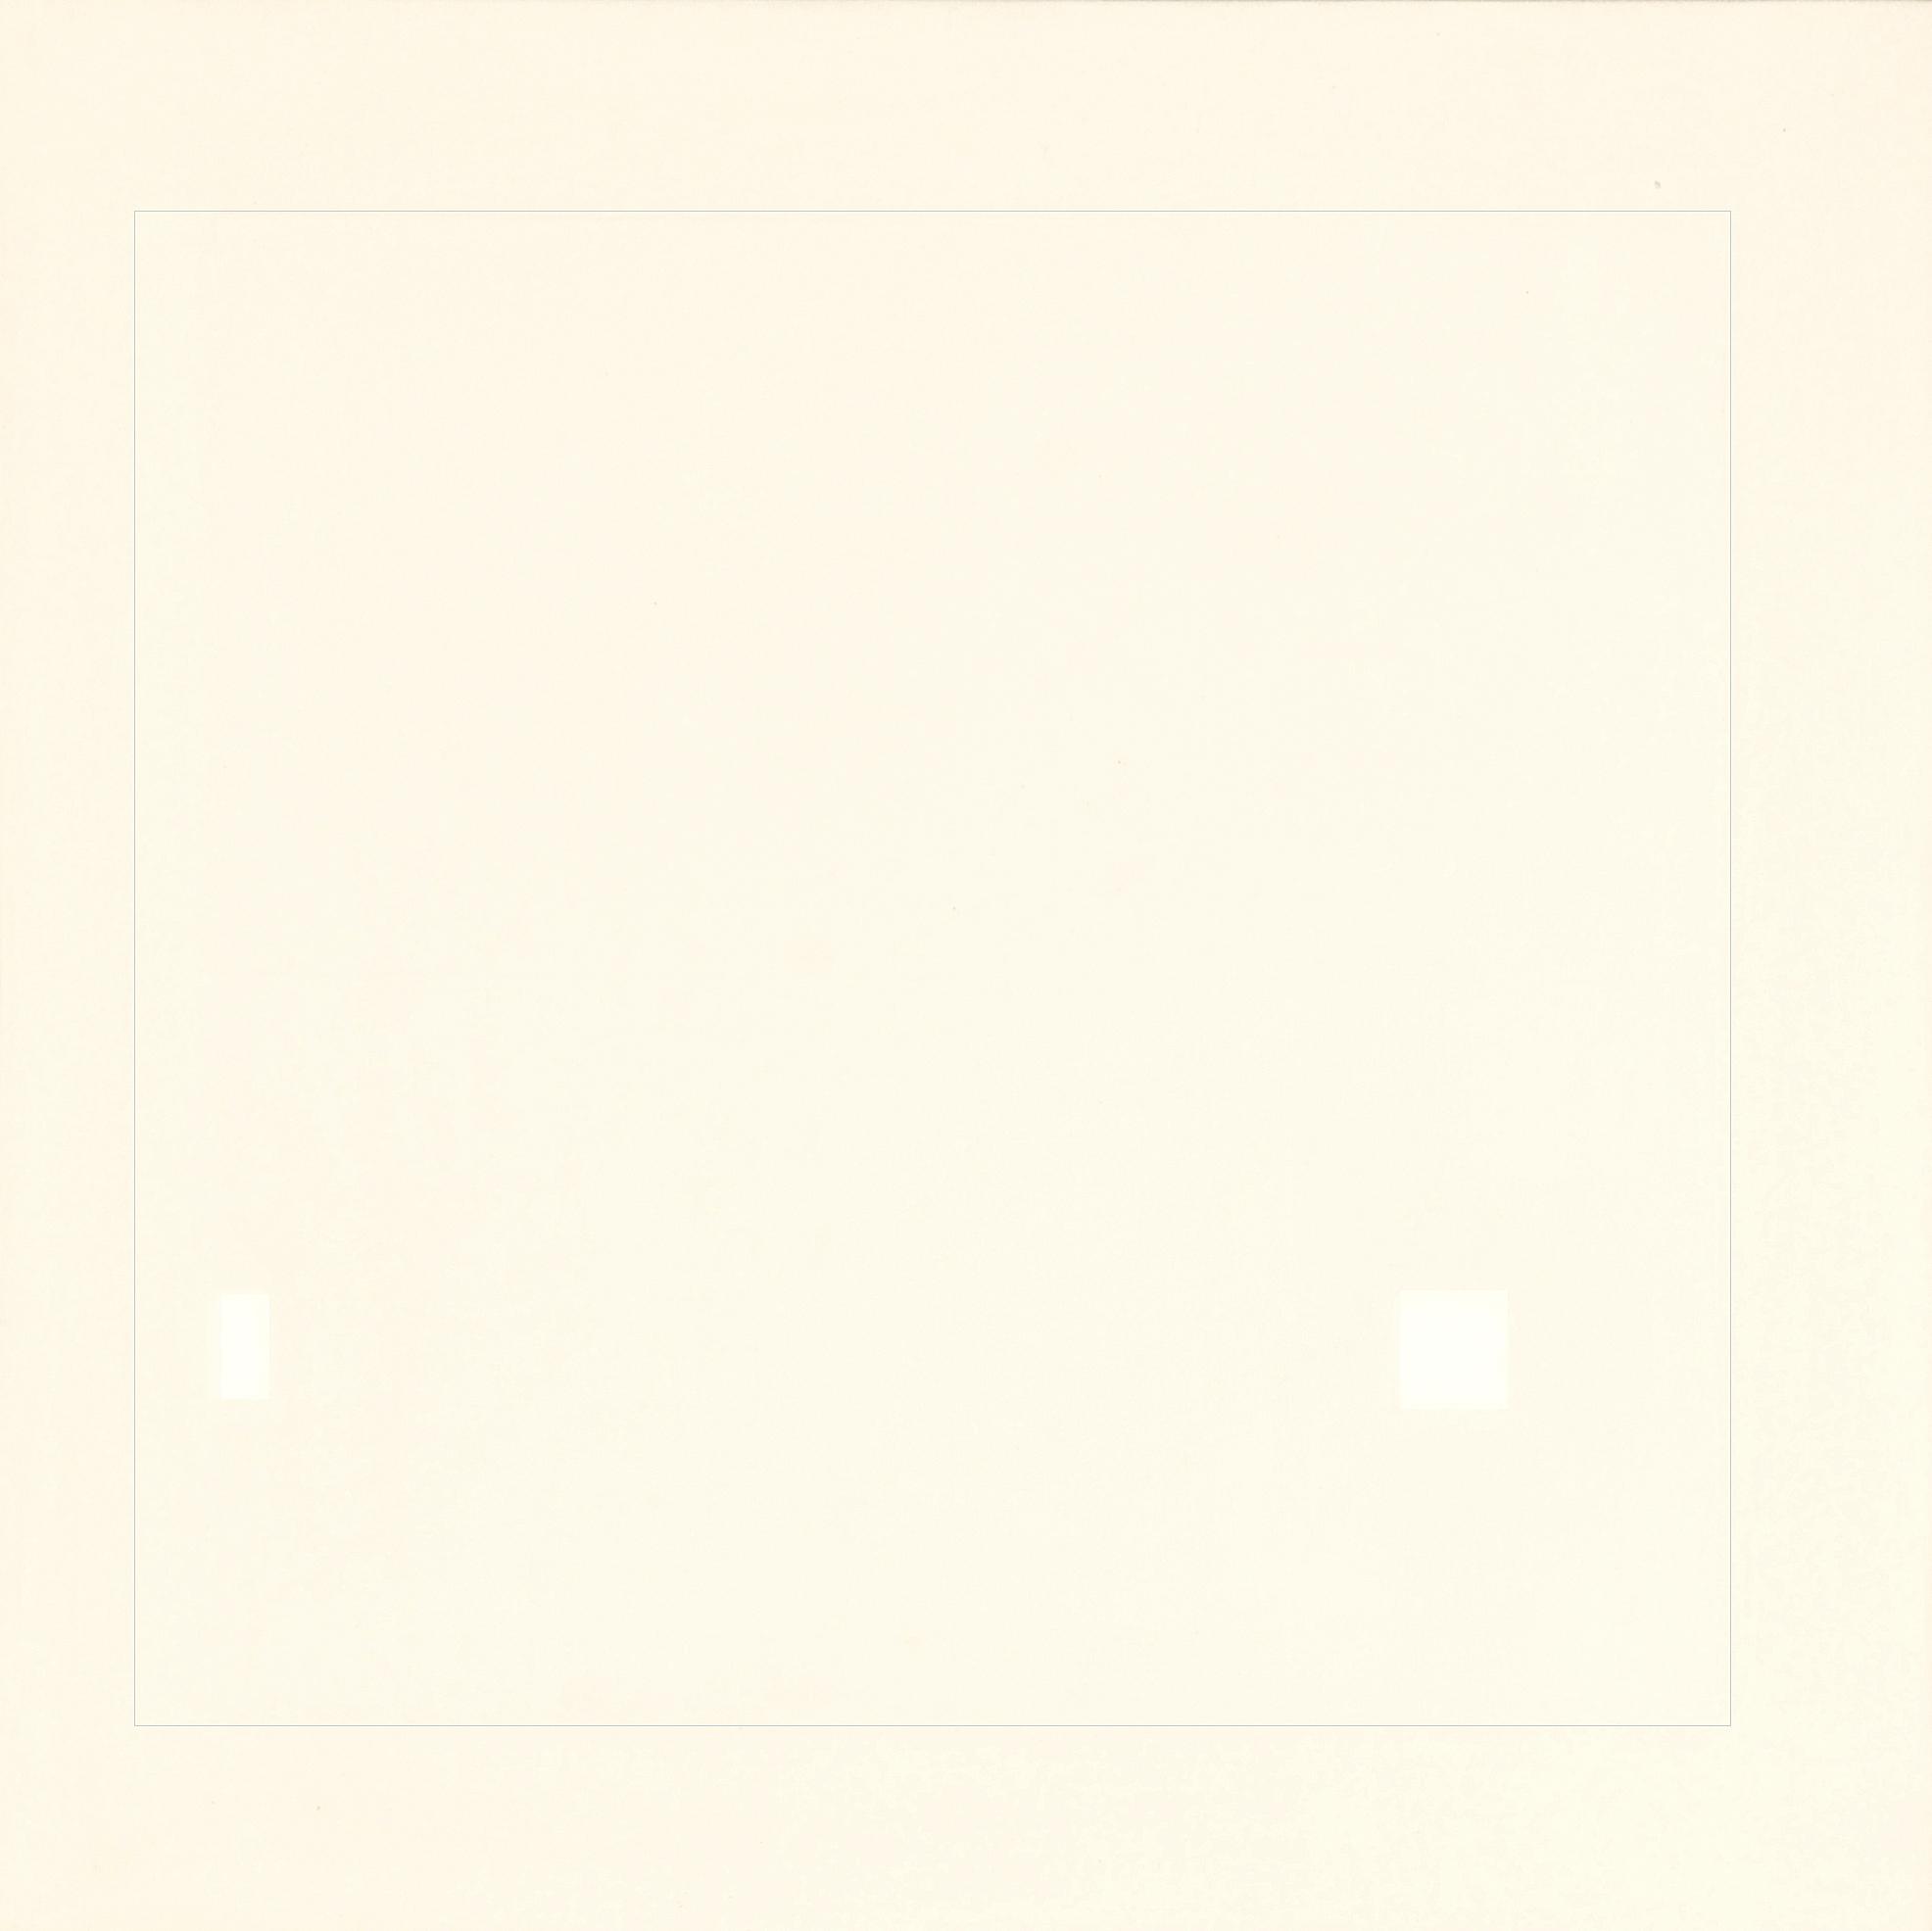 Calderara Antonio, Attrazione quadrata bianca nel rosa